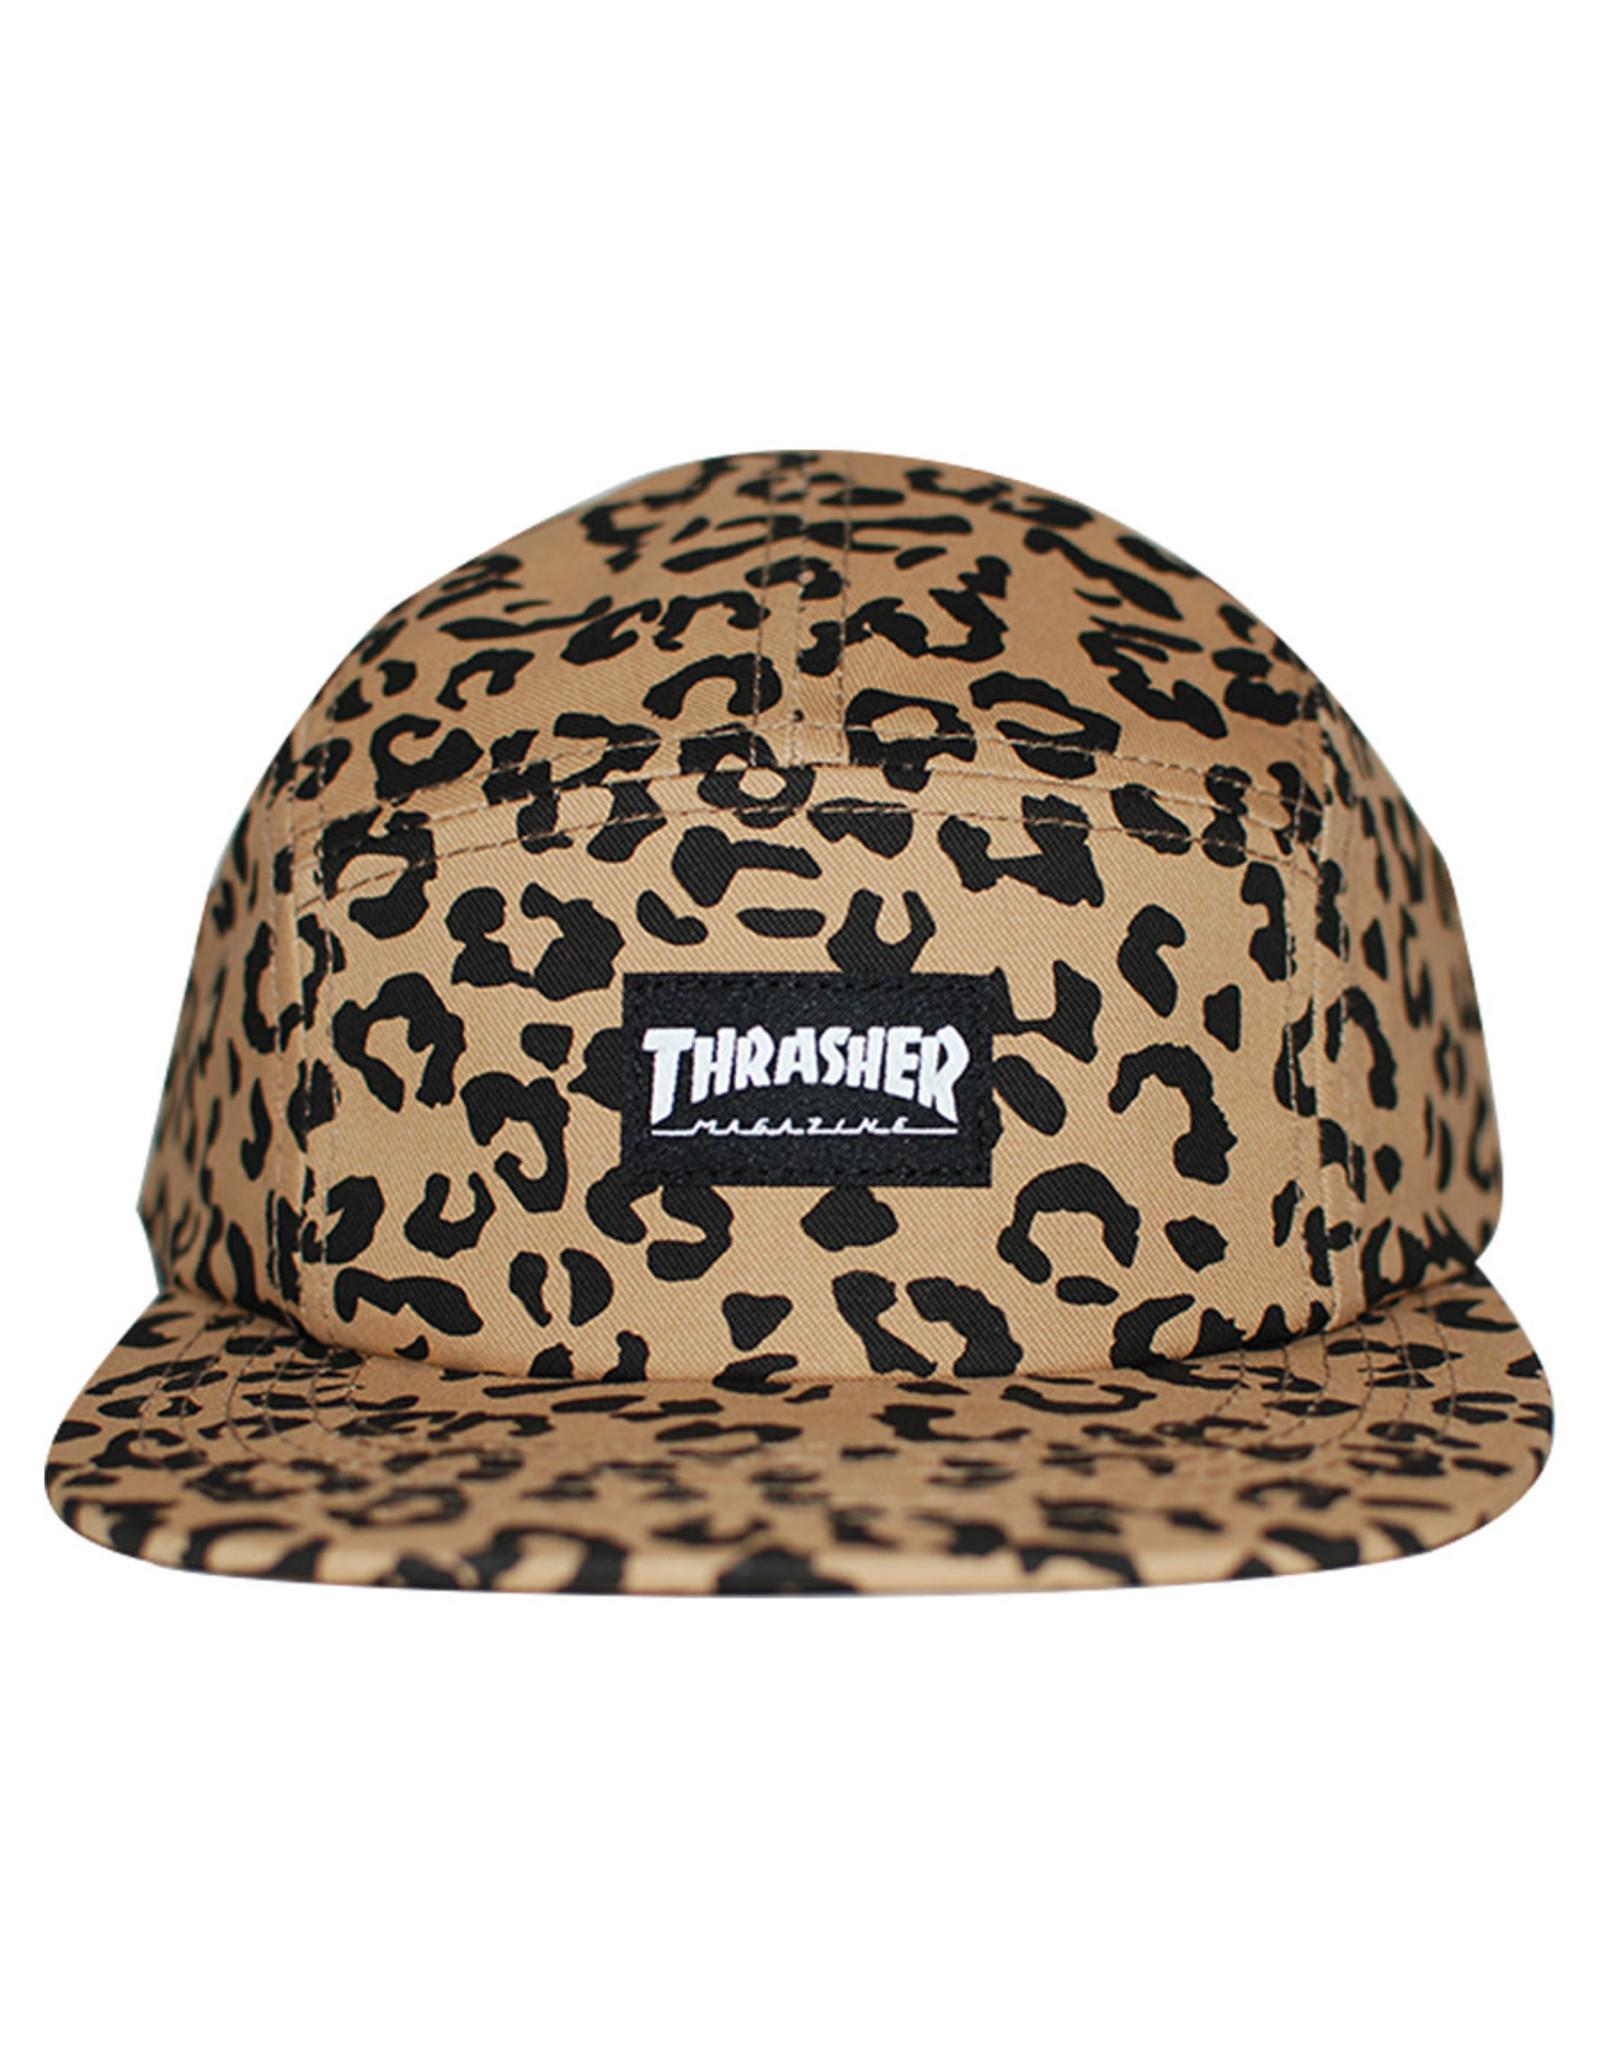 Thrasher Thrasher Hat 5 Panel Strapback (Cheetah)